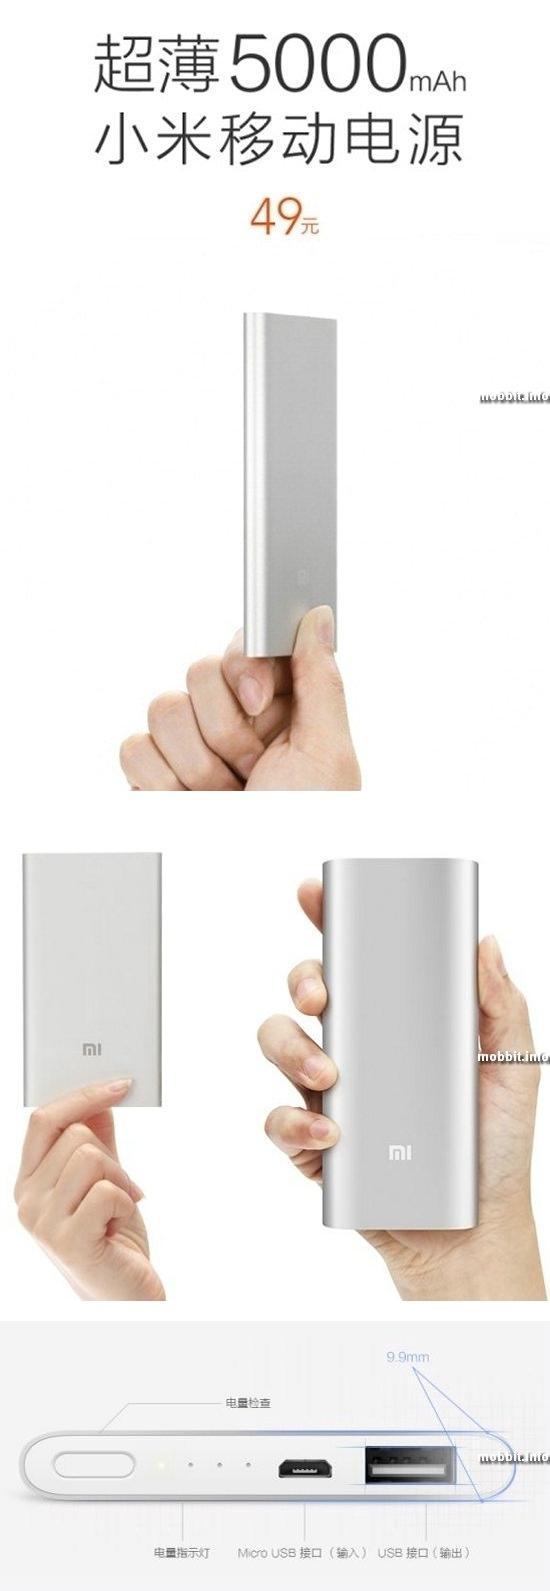 Xiaomi Mi Power Bank